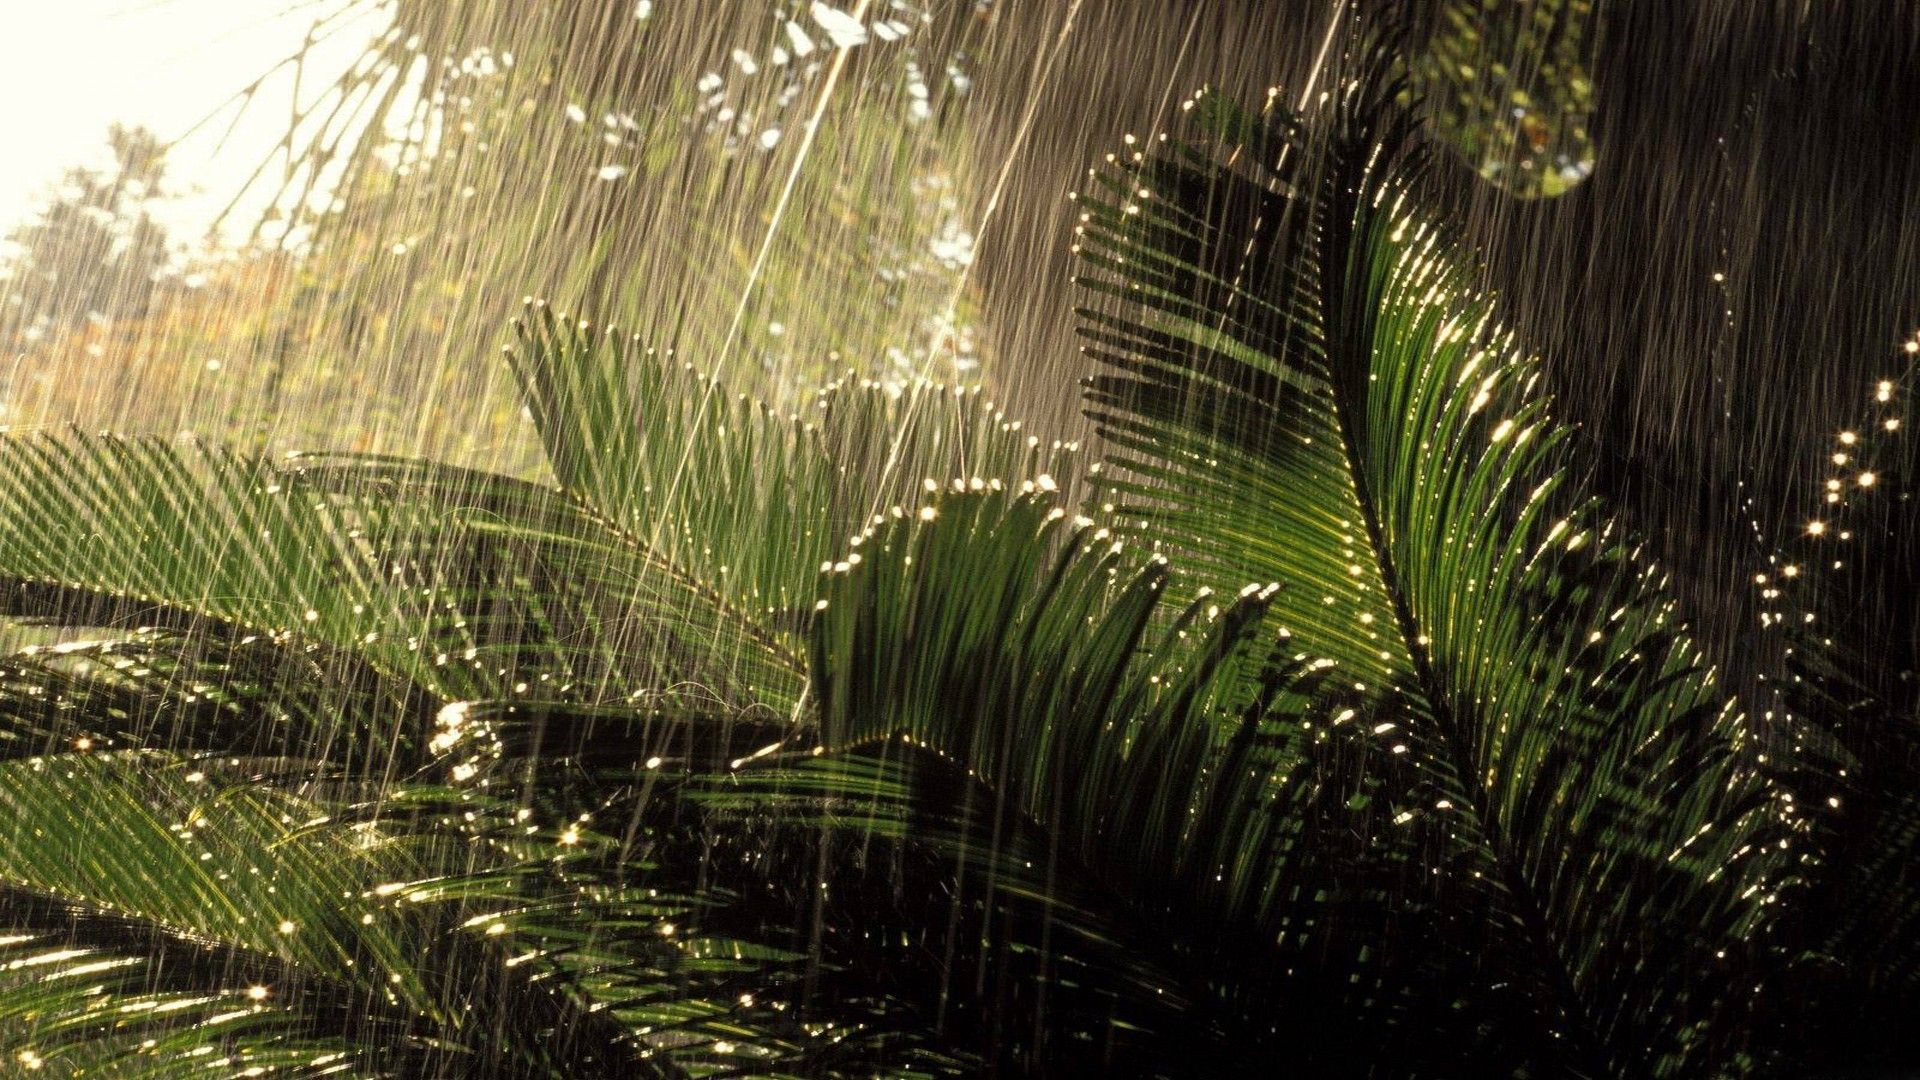 Nature Wallpaper Rainy Season   wallpaperxy.com   Natural ...